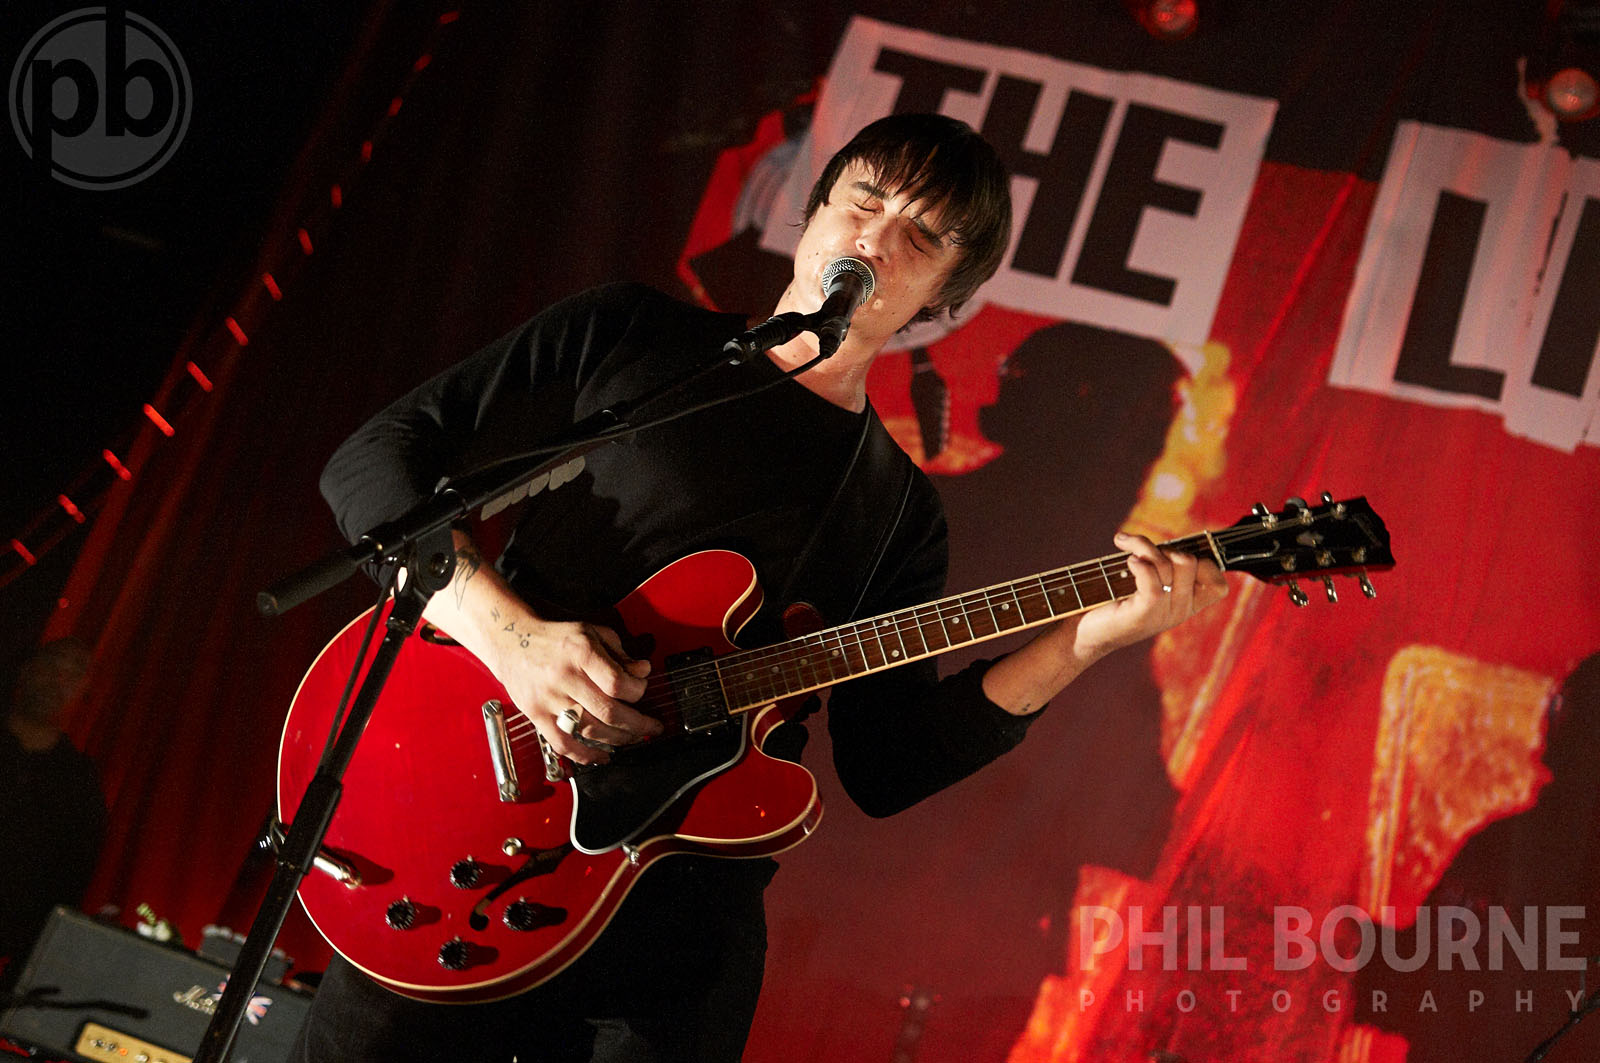 014_Live_Music_Photographer_London_Libertines_Peter_Doherty_001.jpg